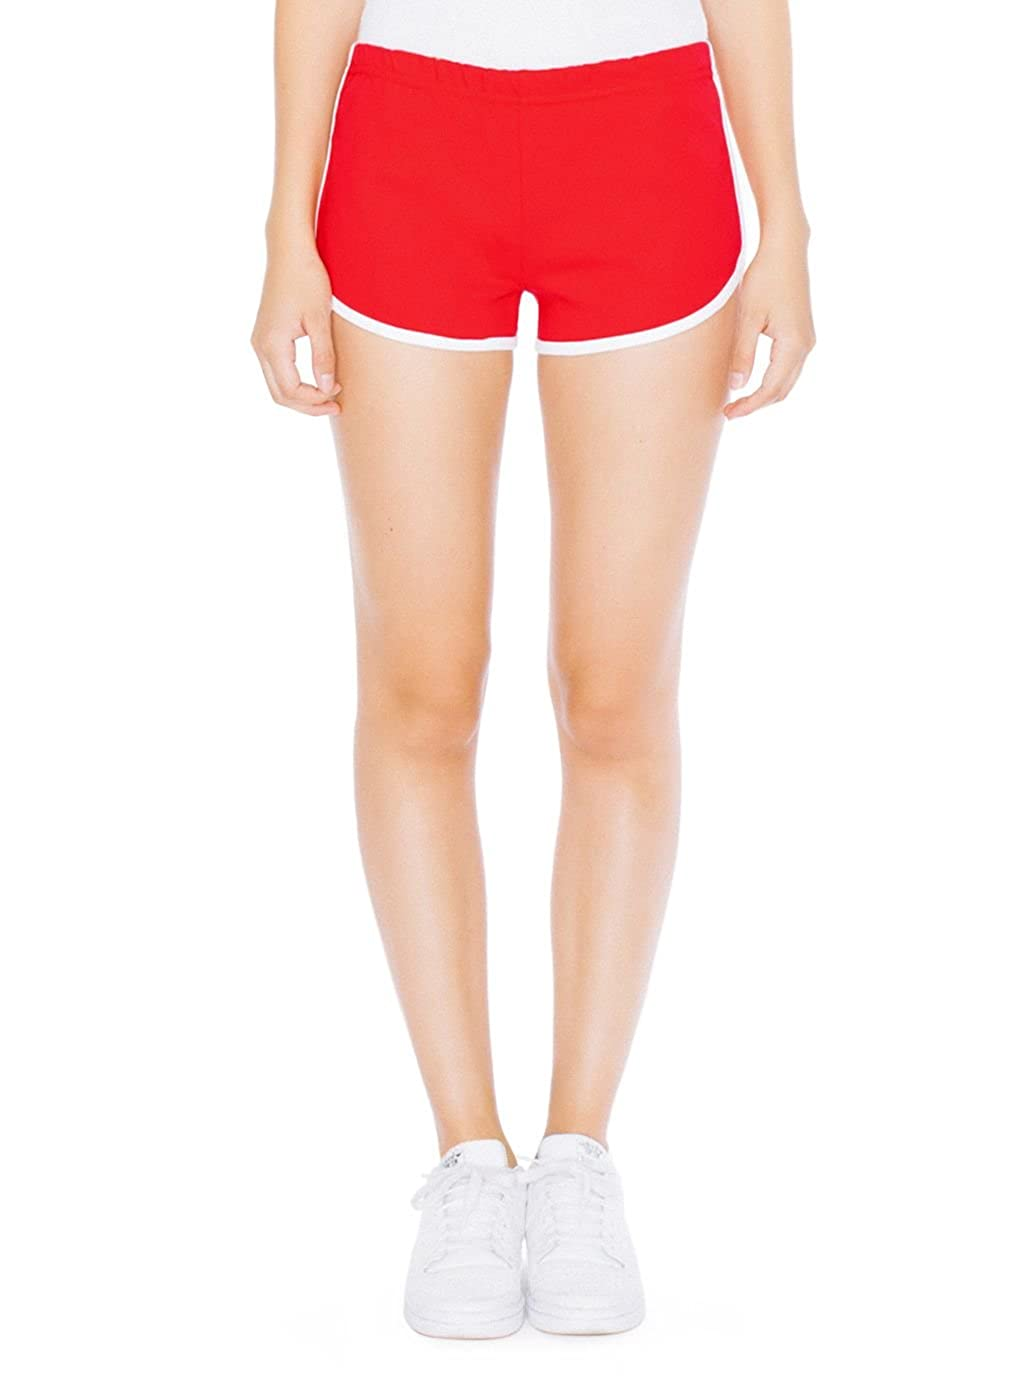 American Apparel Interlock Running Short - Red / White / S